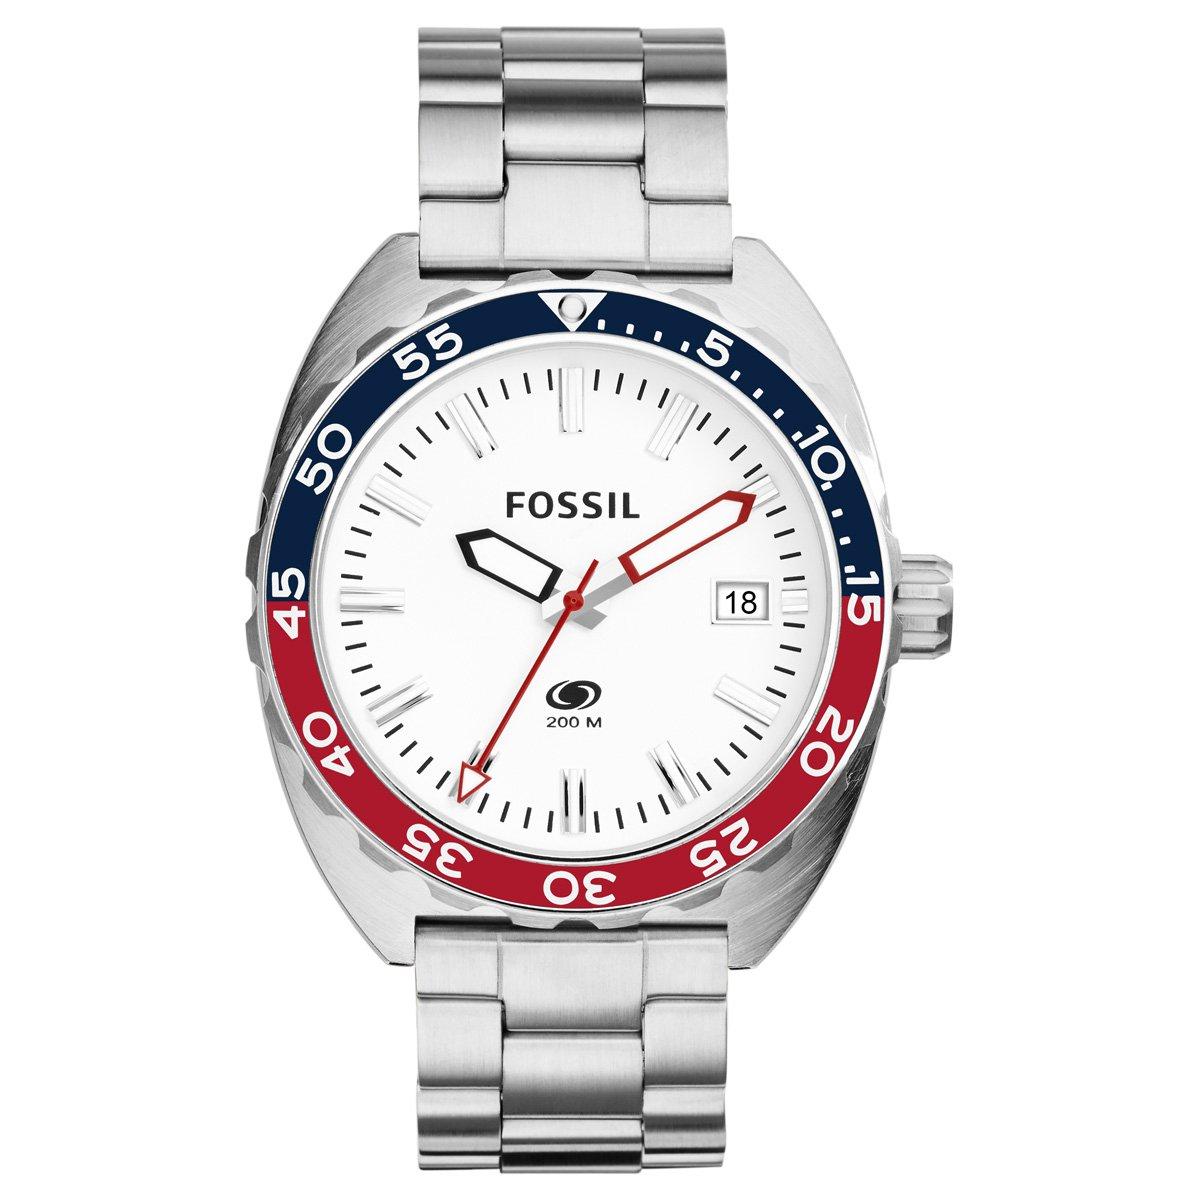 21a3453987992 Relógio Fossil Analógico - Prata - Compre Agora   Zattini